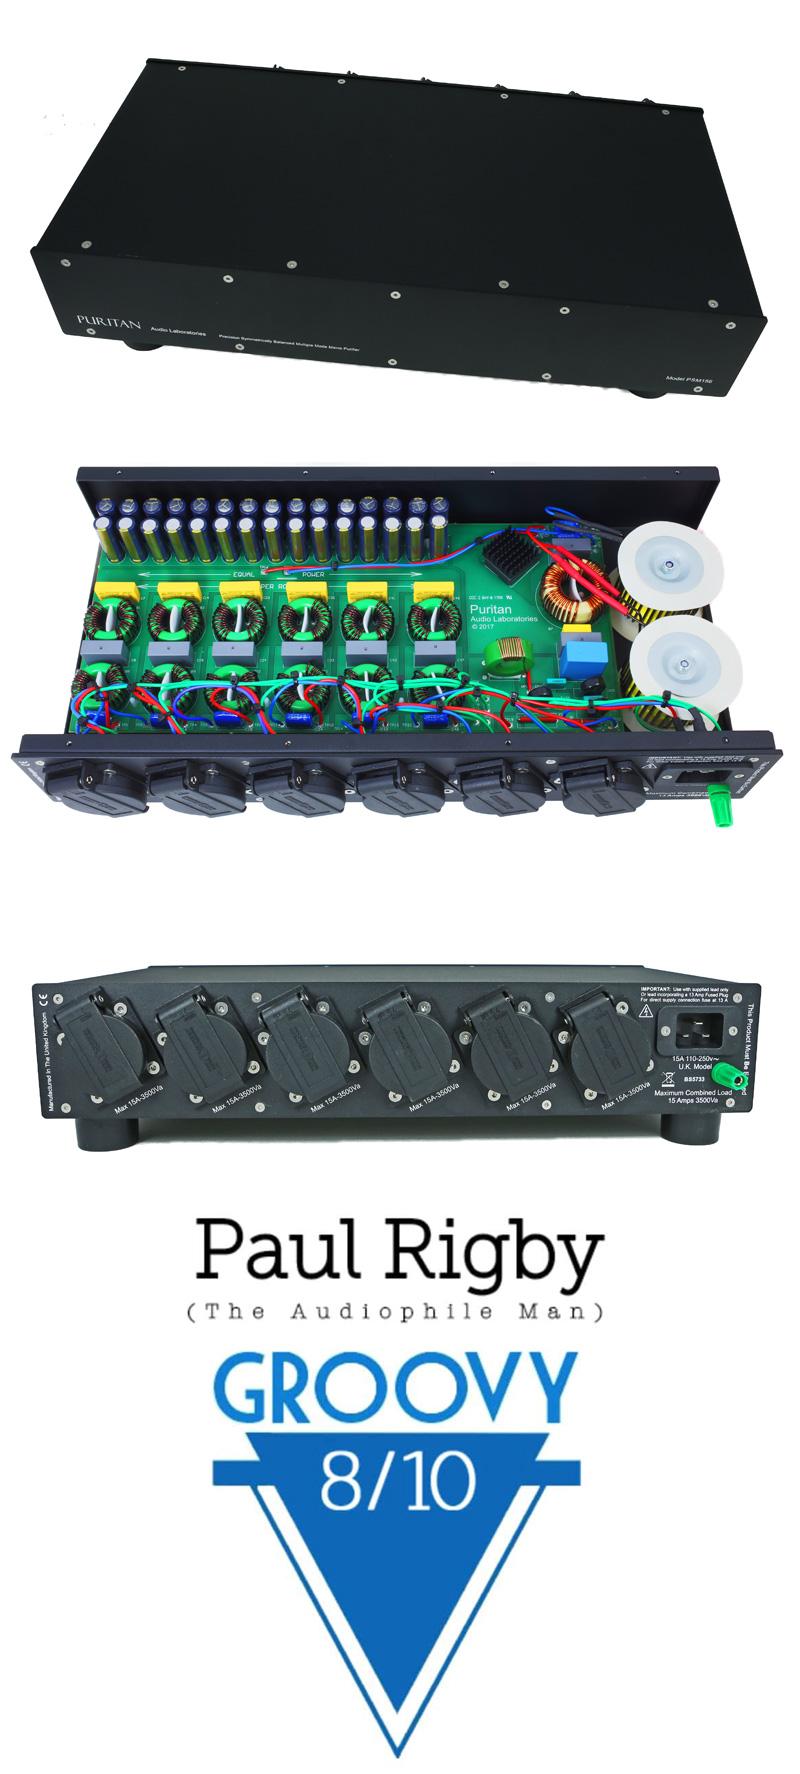 PSM156 - Puritan Audio Laboratories